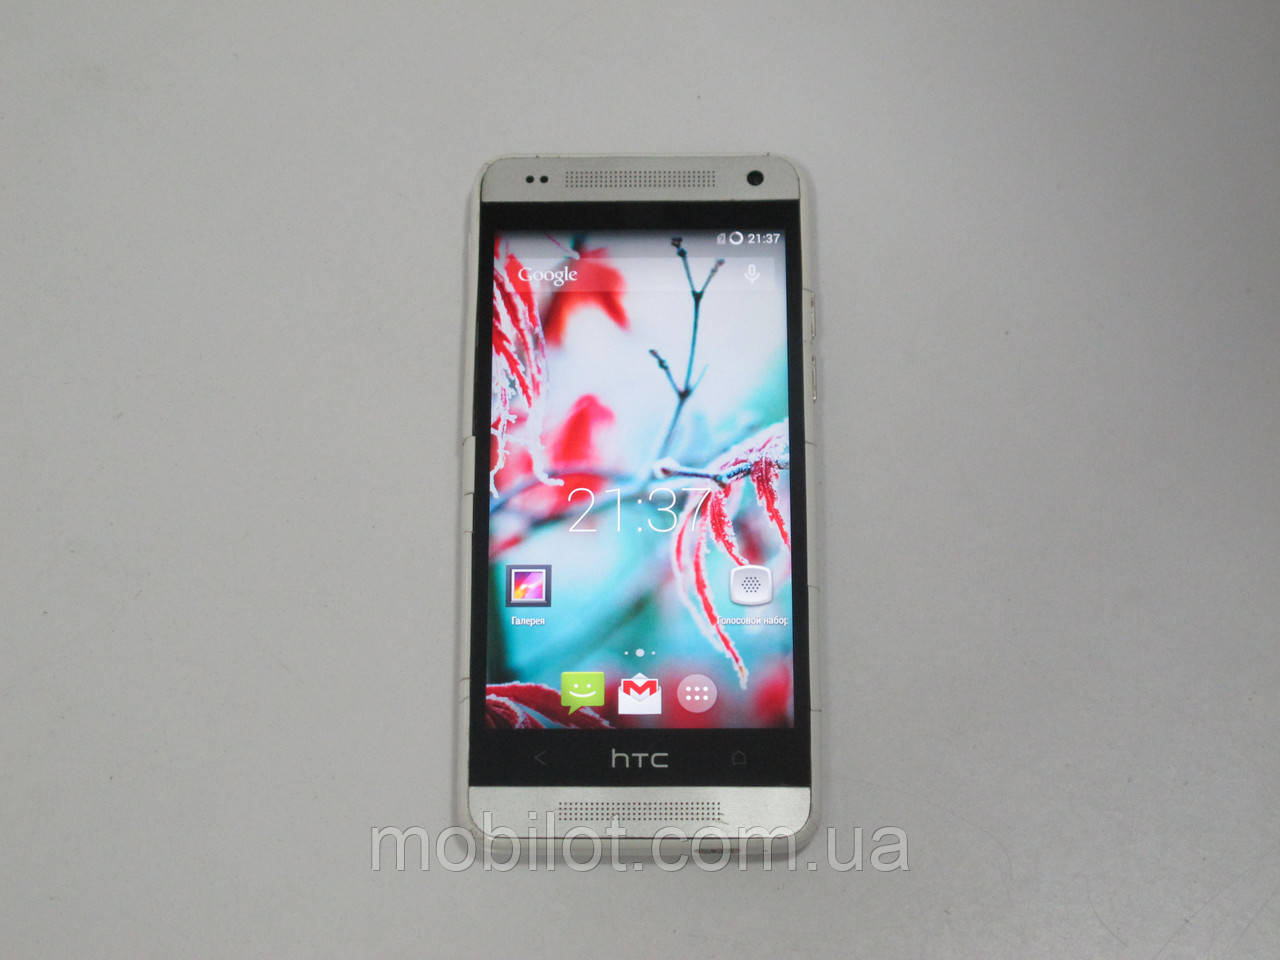 Мобильный телефон  HTC ONE MINI 601n Silver (TZ-1106)